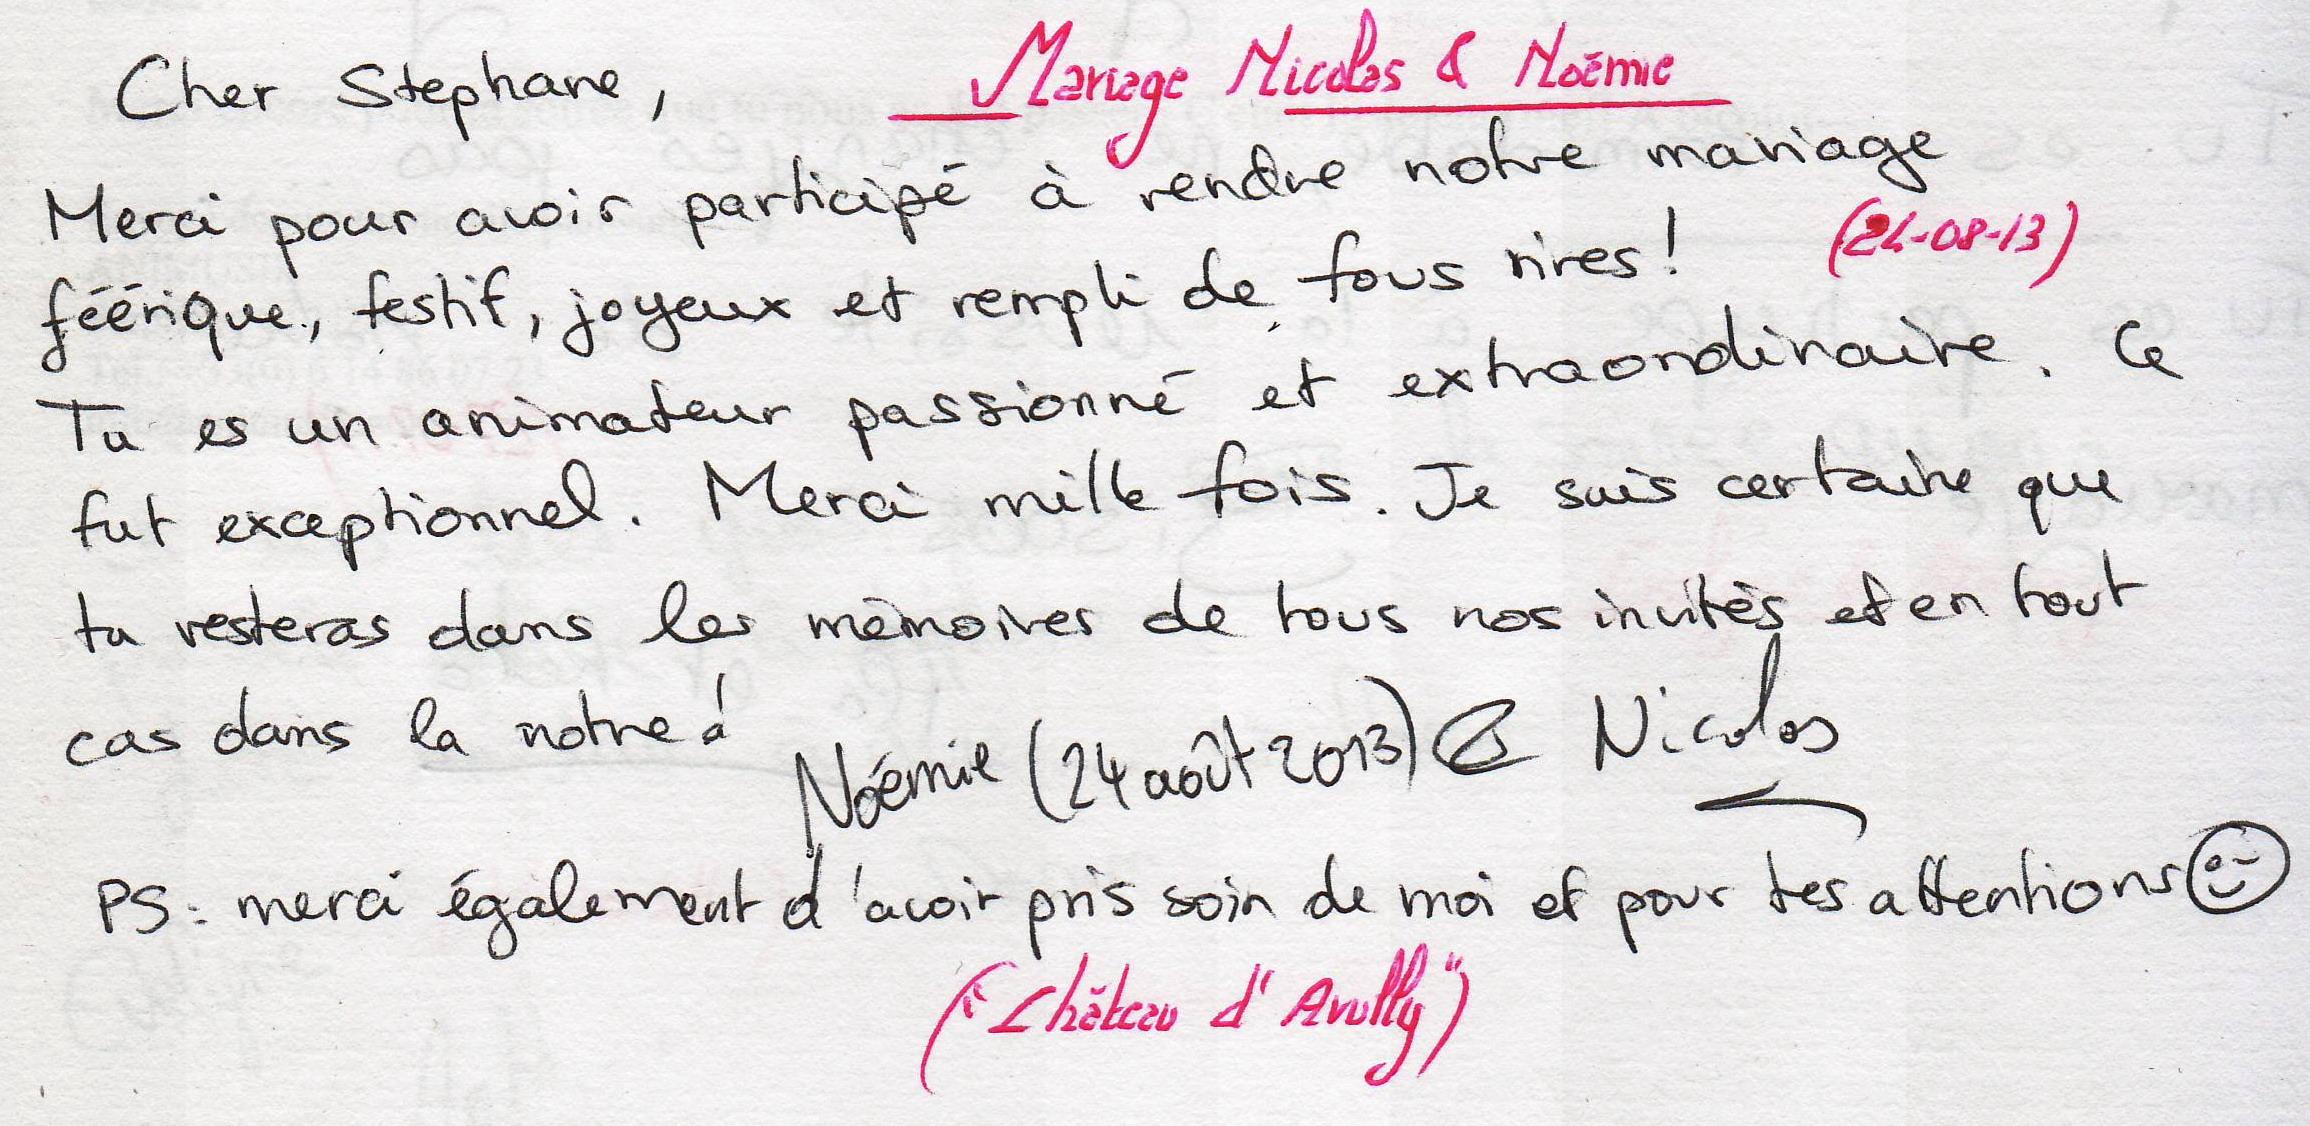 Mariage LUDWIG Nicolas & Noémie (Château d'Avully) (24-08-2013)